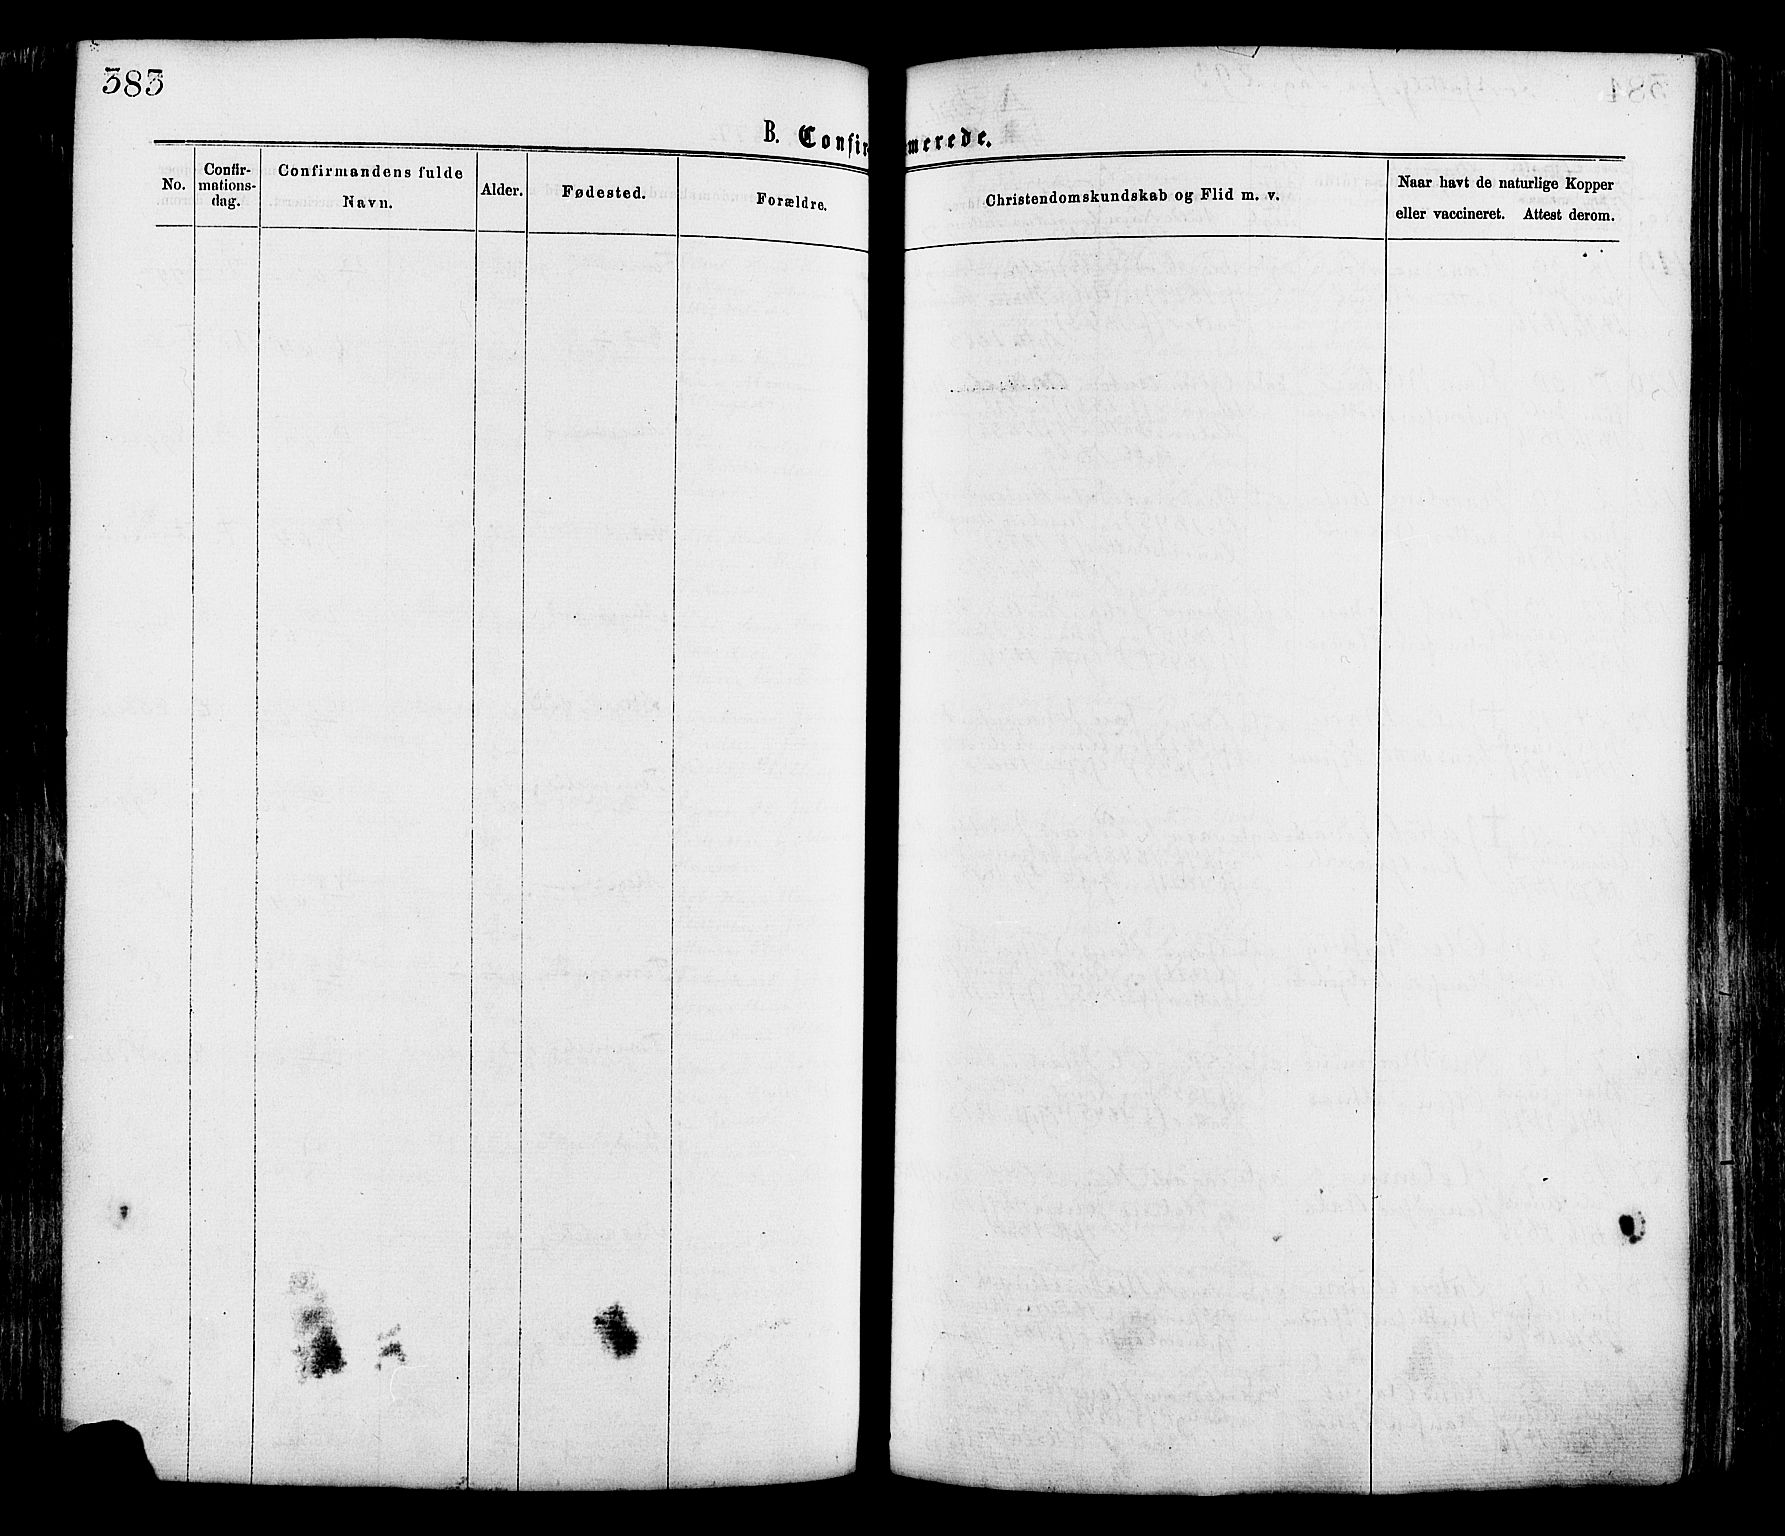 SAO, Onsøy prestekontor Kirkebøker, F/Fa/L0004: Ministerialbok nr. I 4, 1861-1877, s. 383